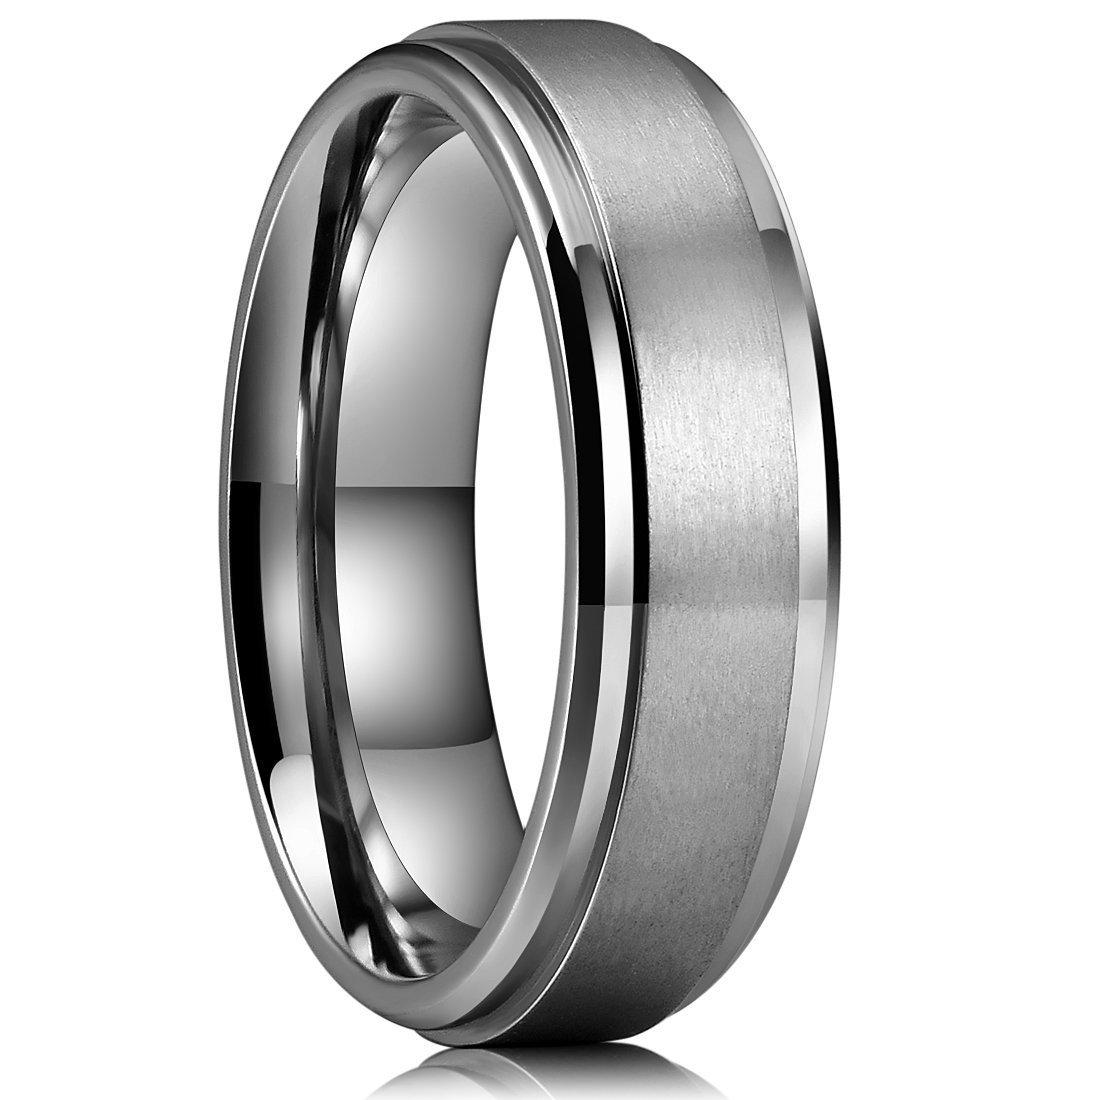 King Will BASIC 6mm Titanium Wedding Ring Matte Finished Wedding Band For Men Women10